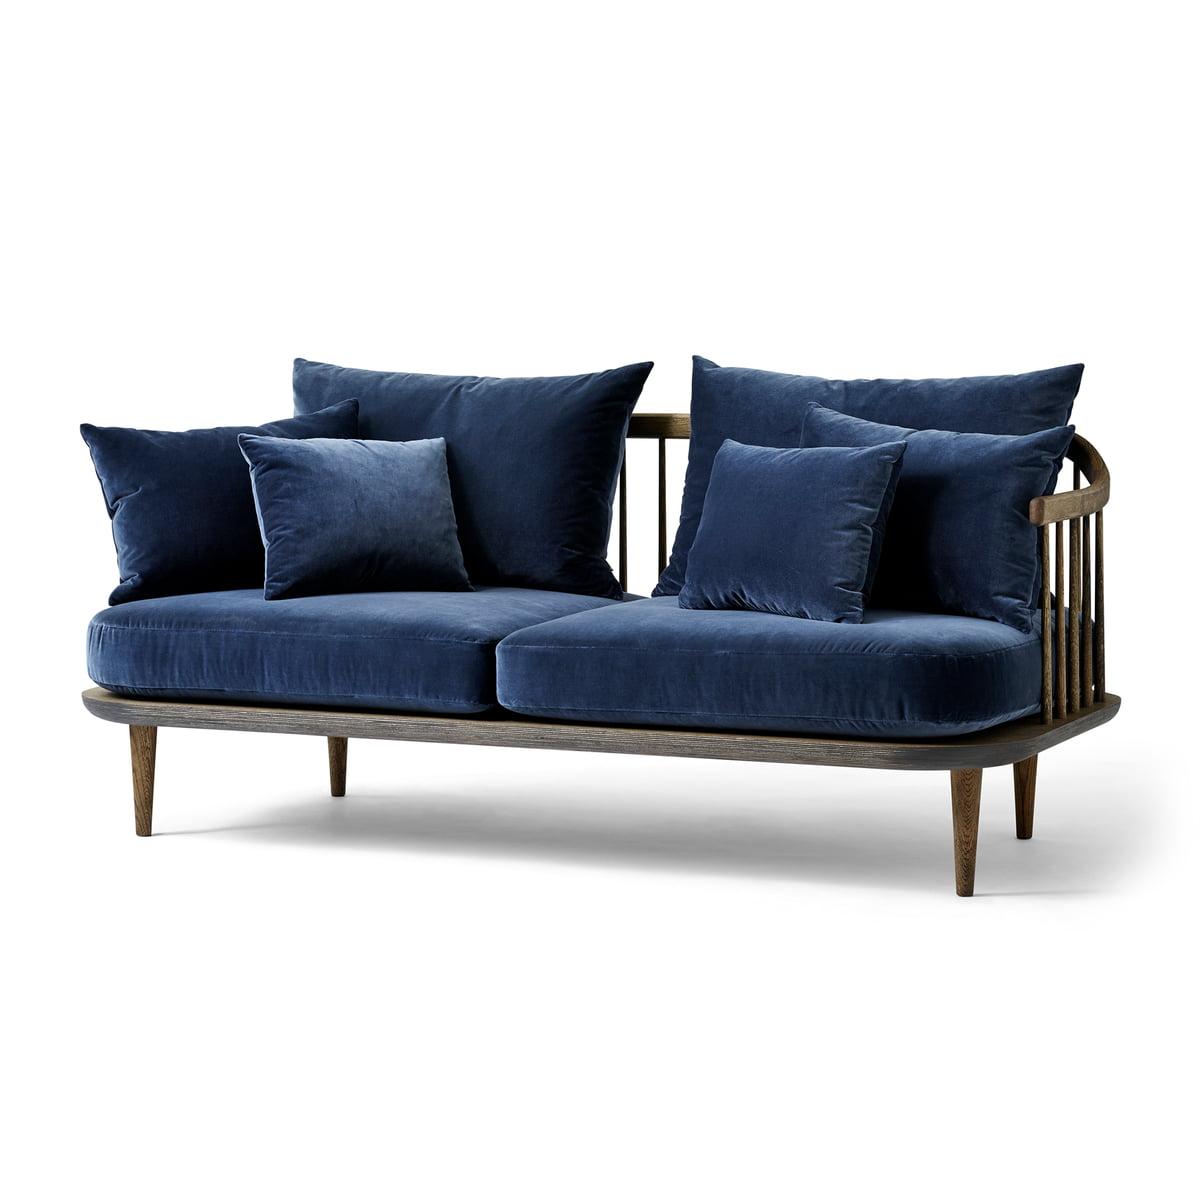 FLY Sofa von &Tradition | Connox Shop